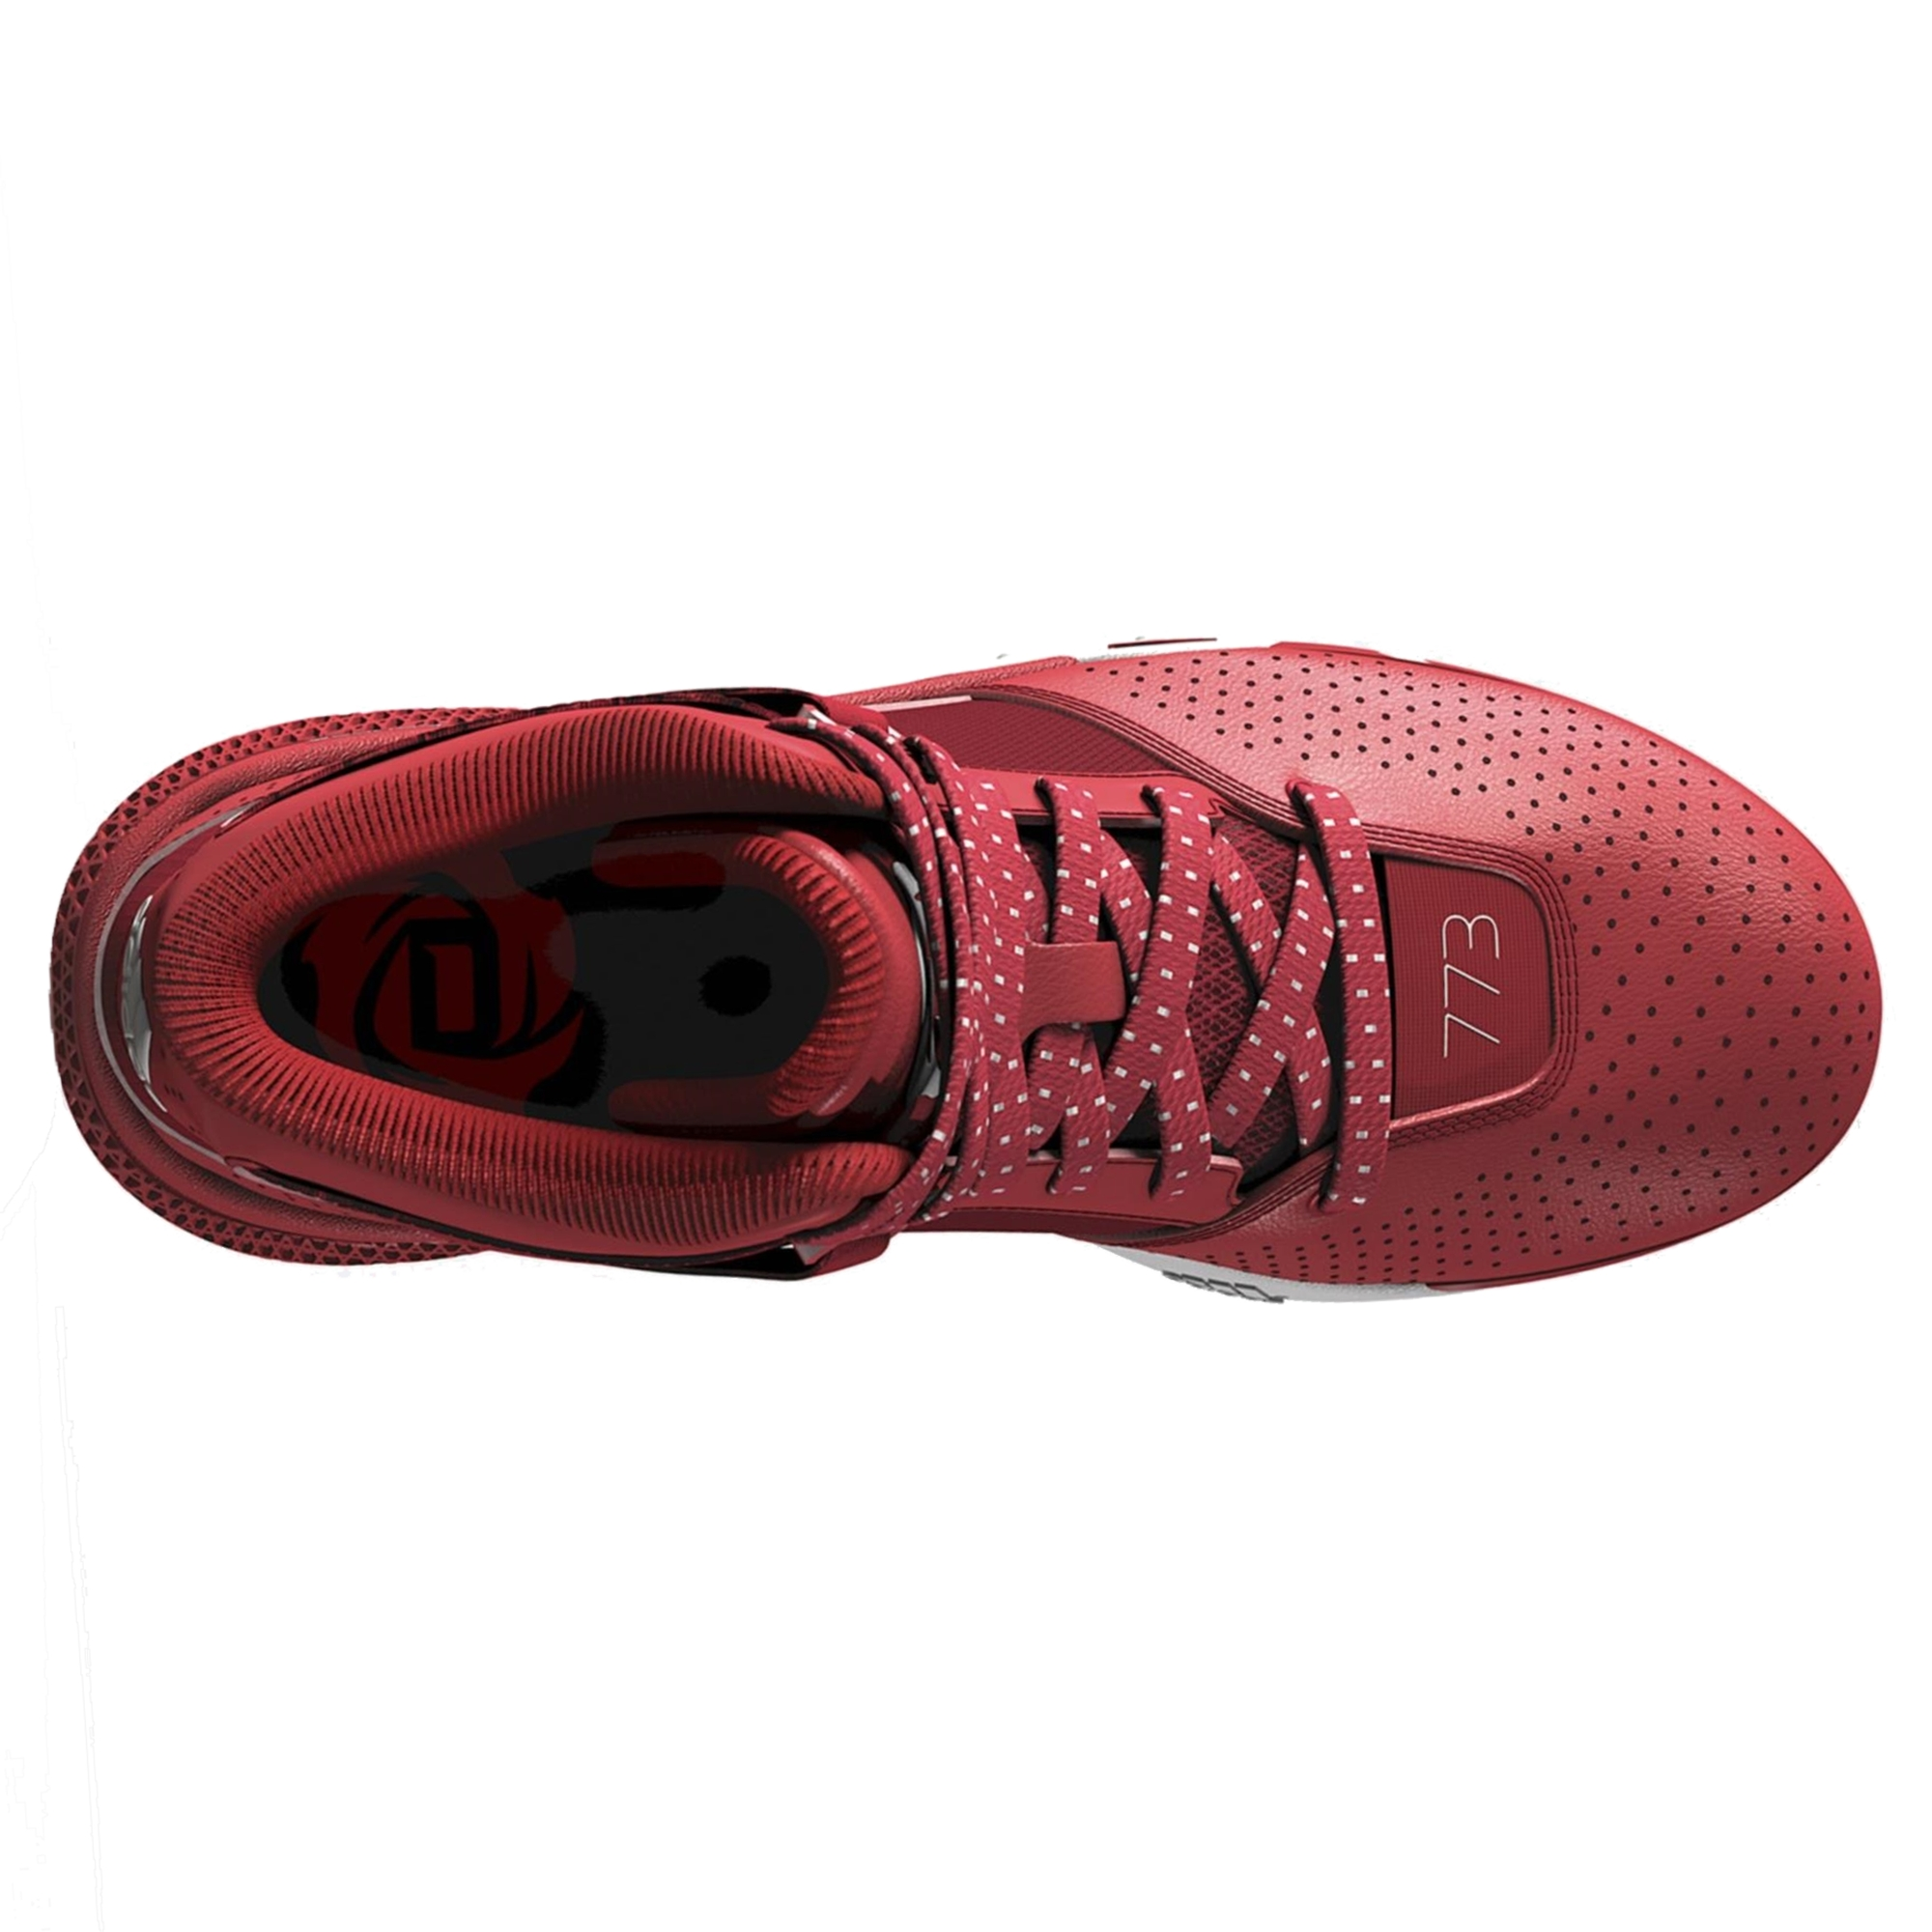 sports shoes f05f2 4424a adidas Derrick Rose 773 IV Junior (Gs) Basketbol Ayakkabısı